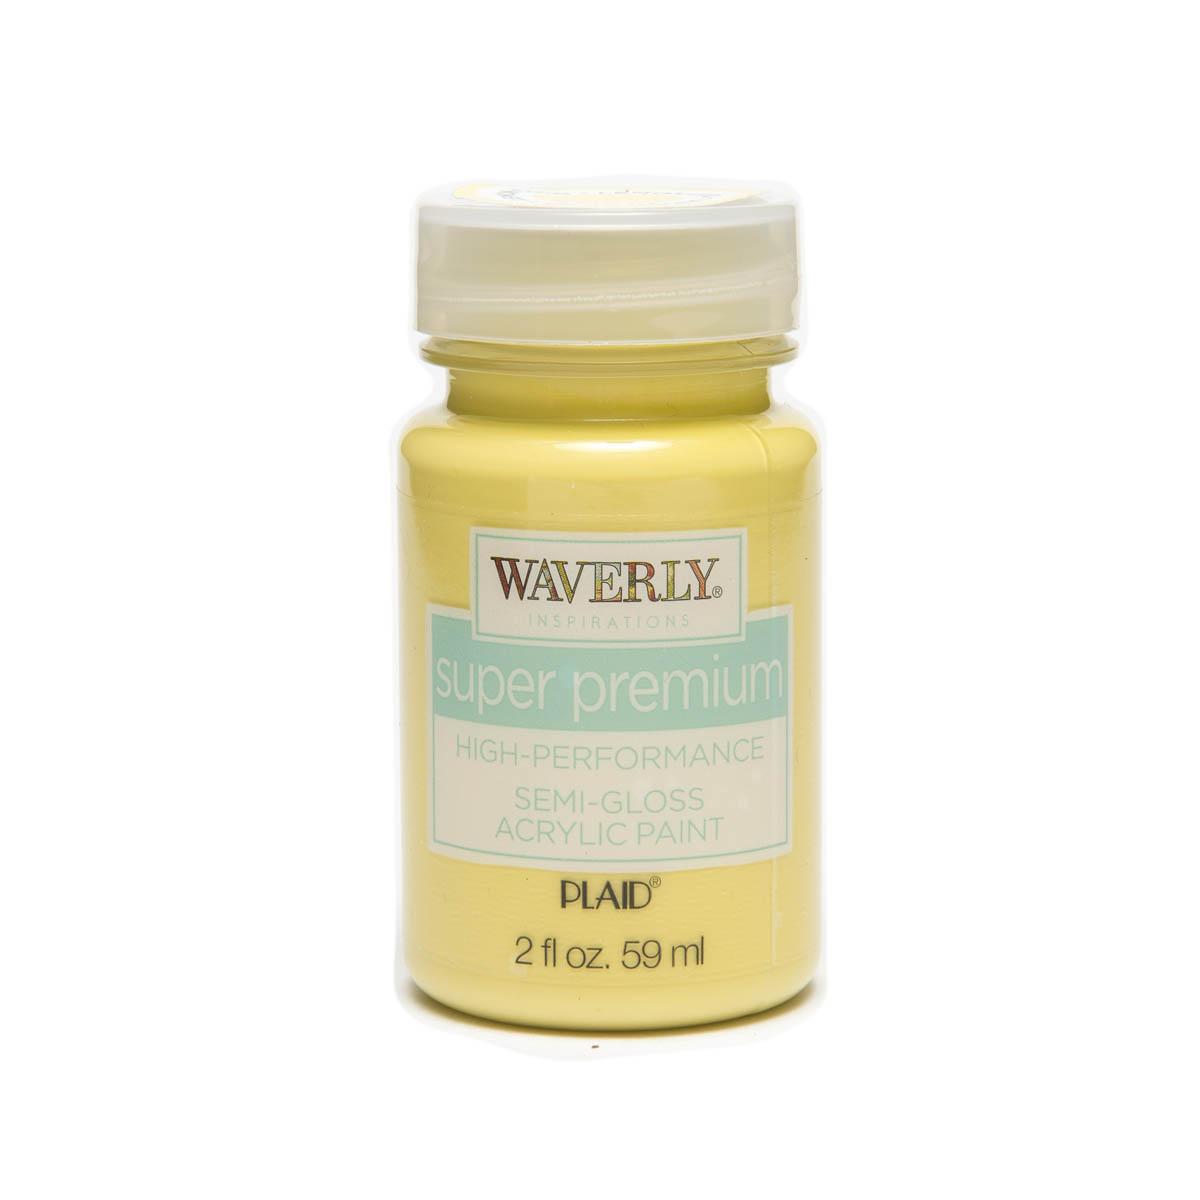 Waverly ® Inspirations Super Premium Semi-Gloss Acrylic Paint - Lemon Curd, 2 oz.